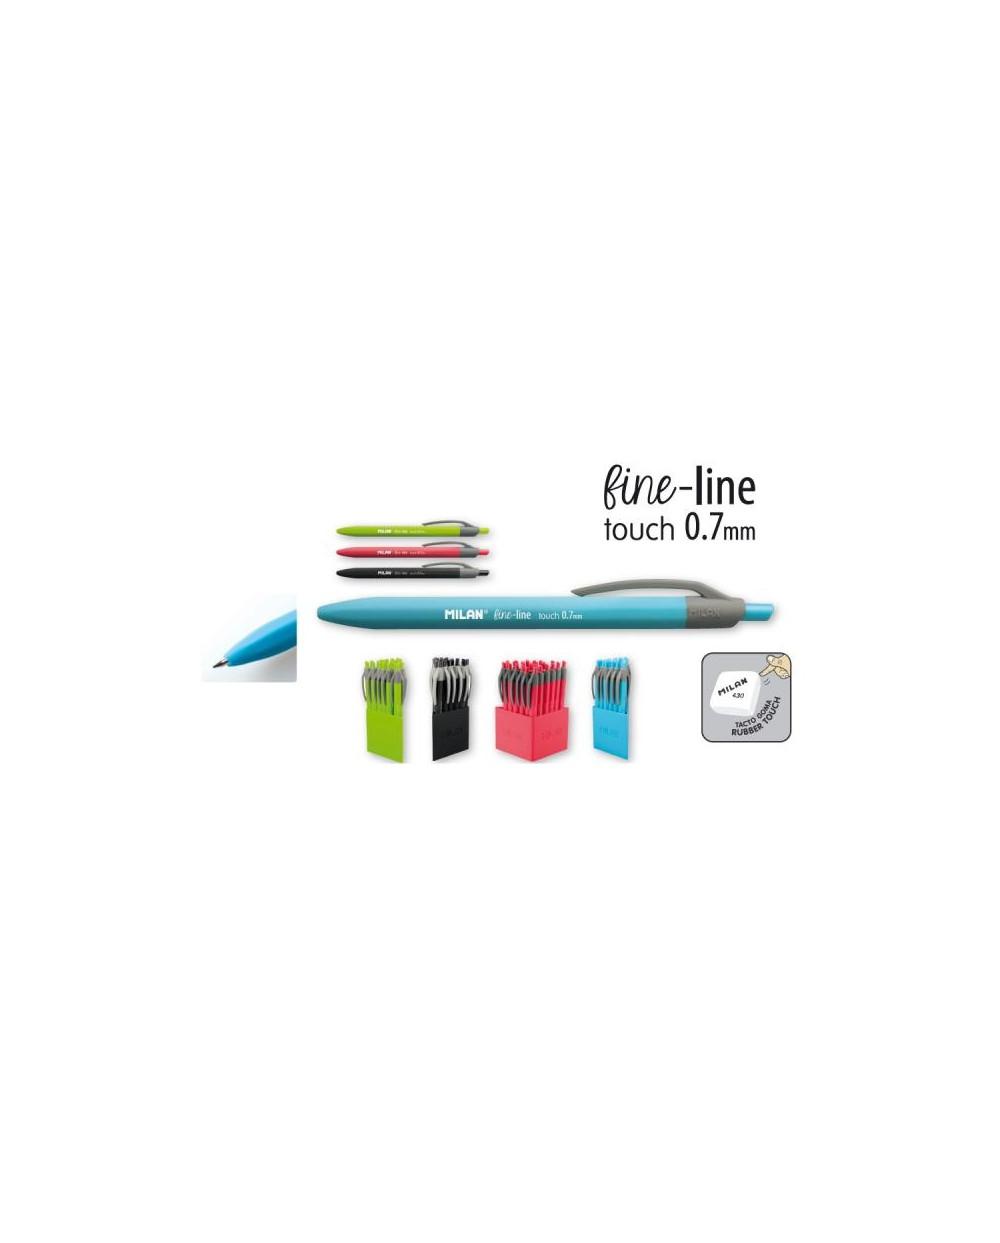 Химикалка автоматична MILAN, P1 fine-line 0.7, Rubber touch